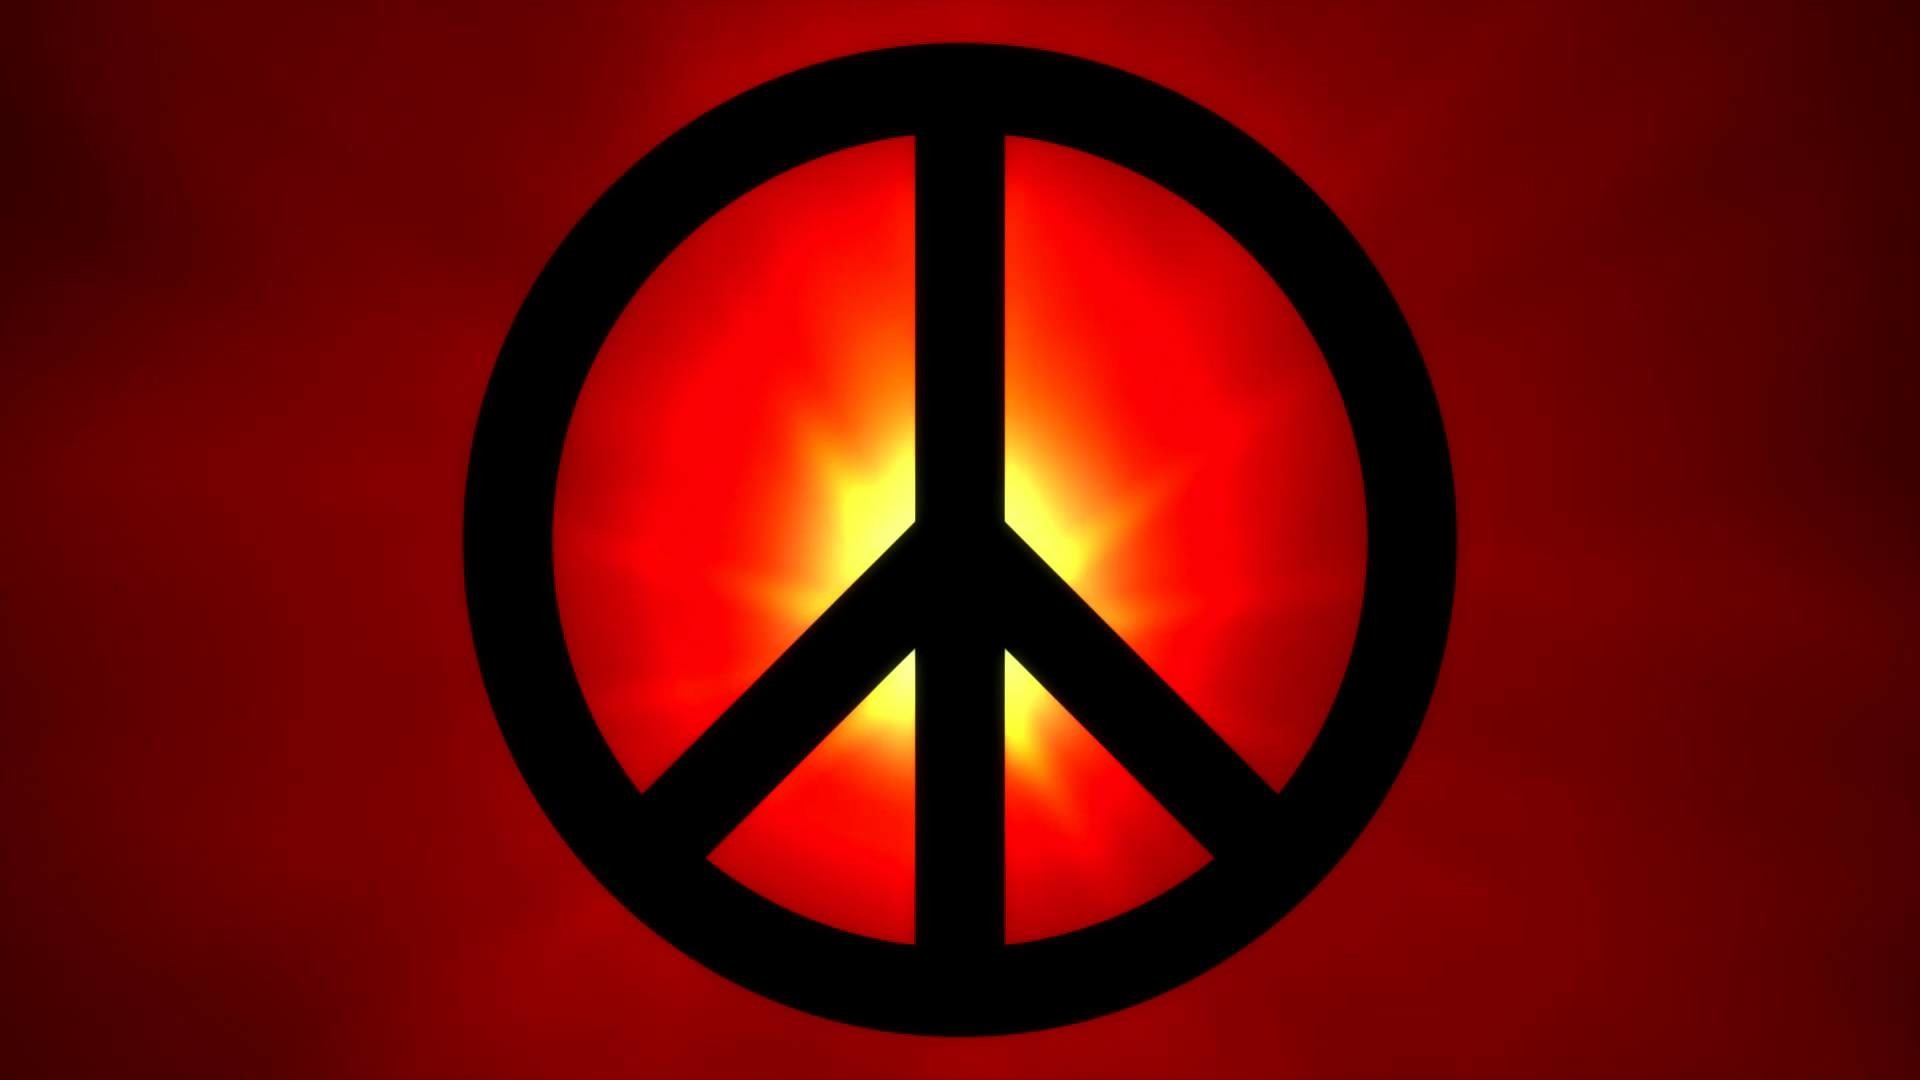 3d Peace Sign Wallpaper 62 Images